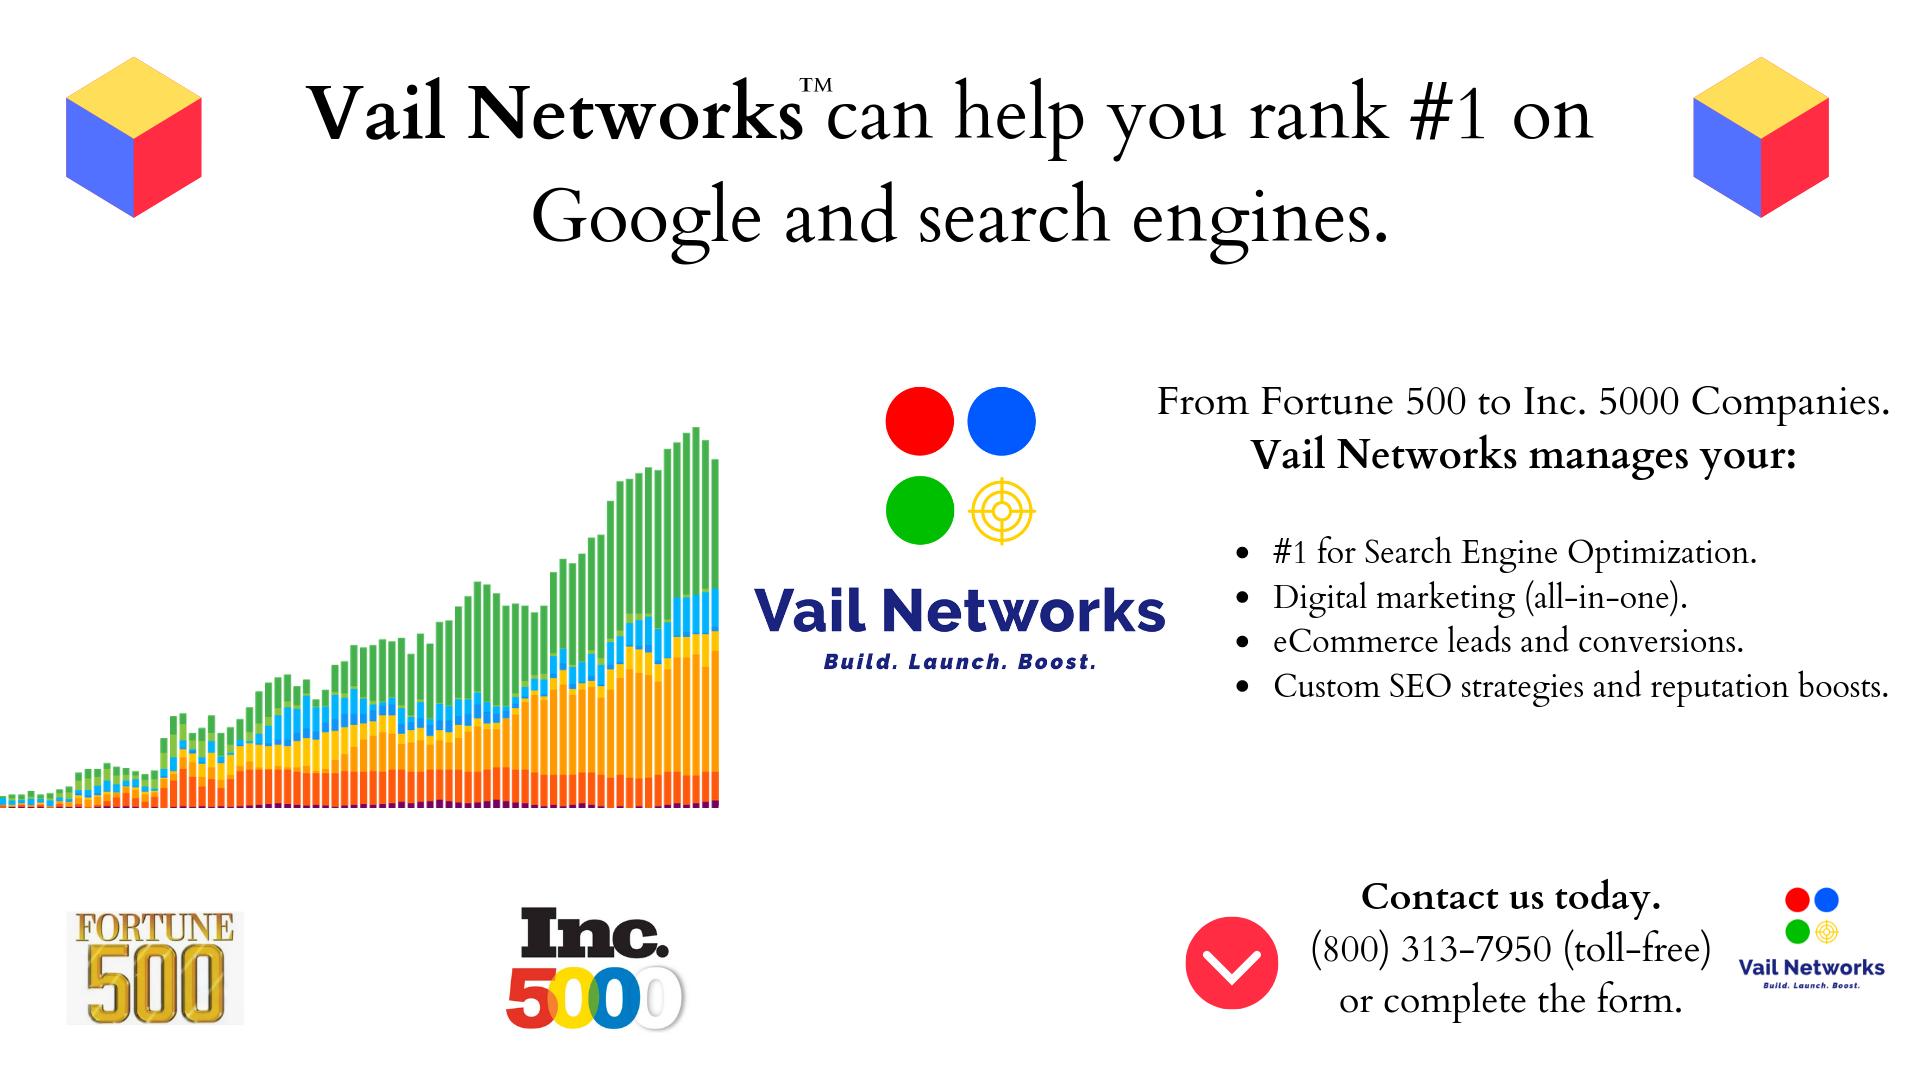 Company to help with SEO and digital marketing: vailnetworks.com